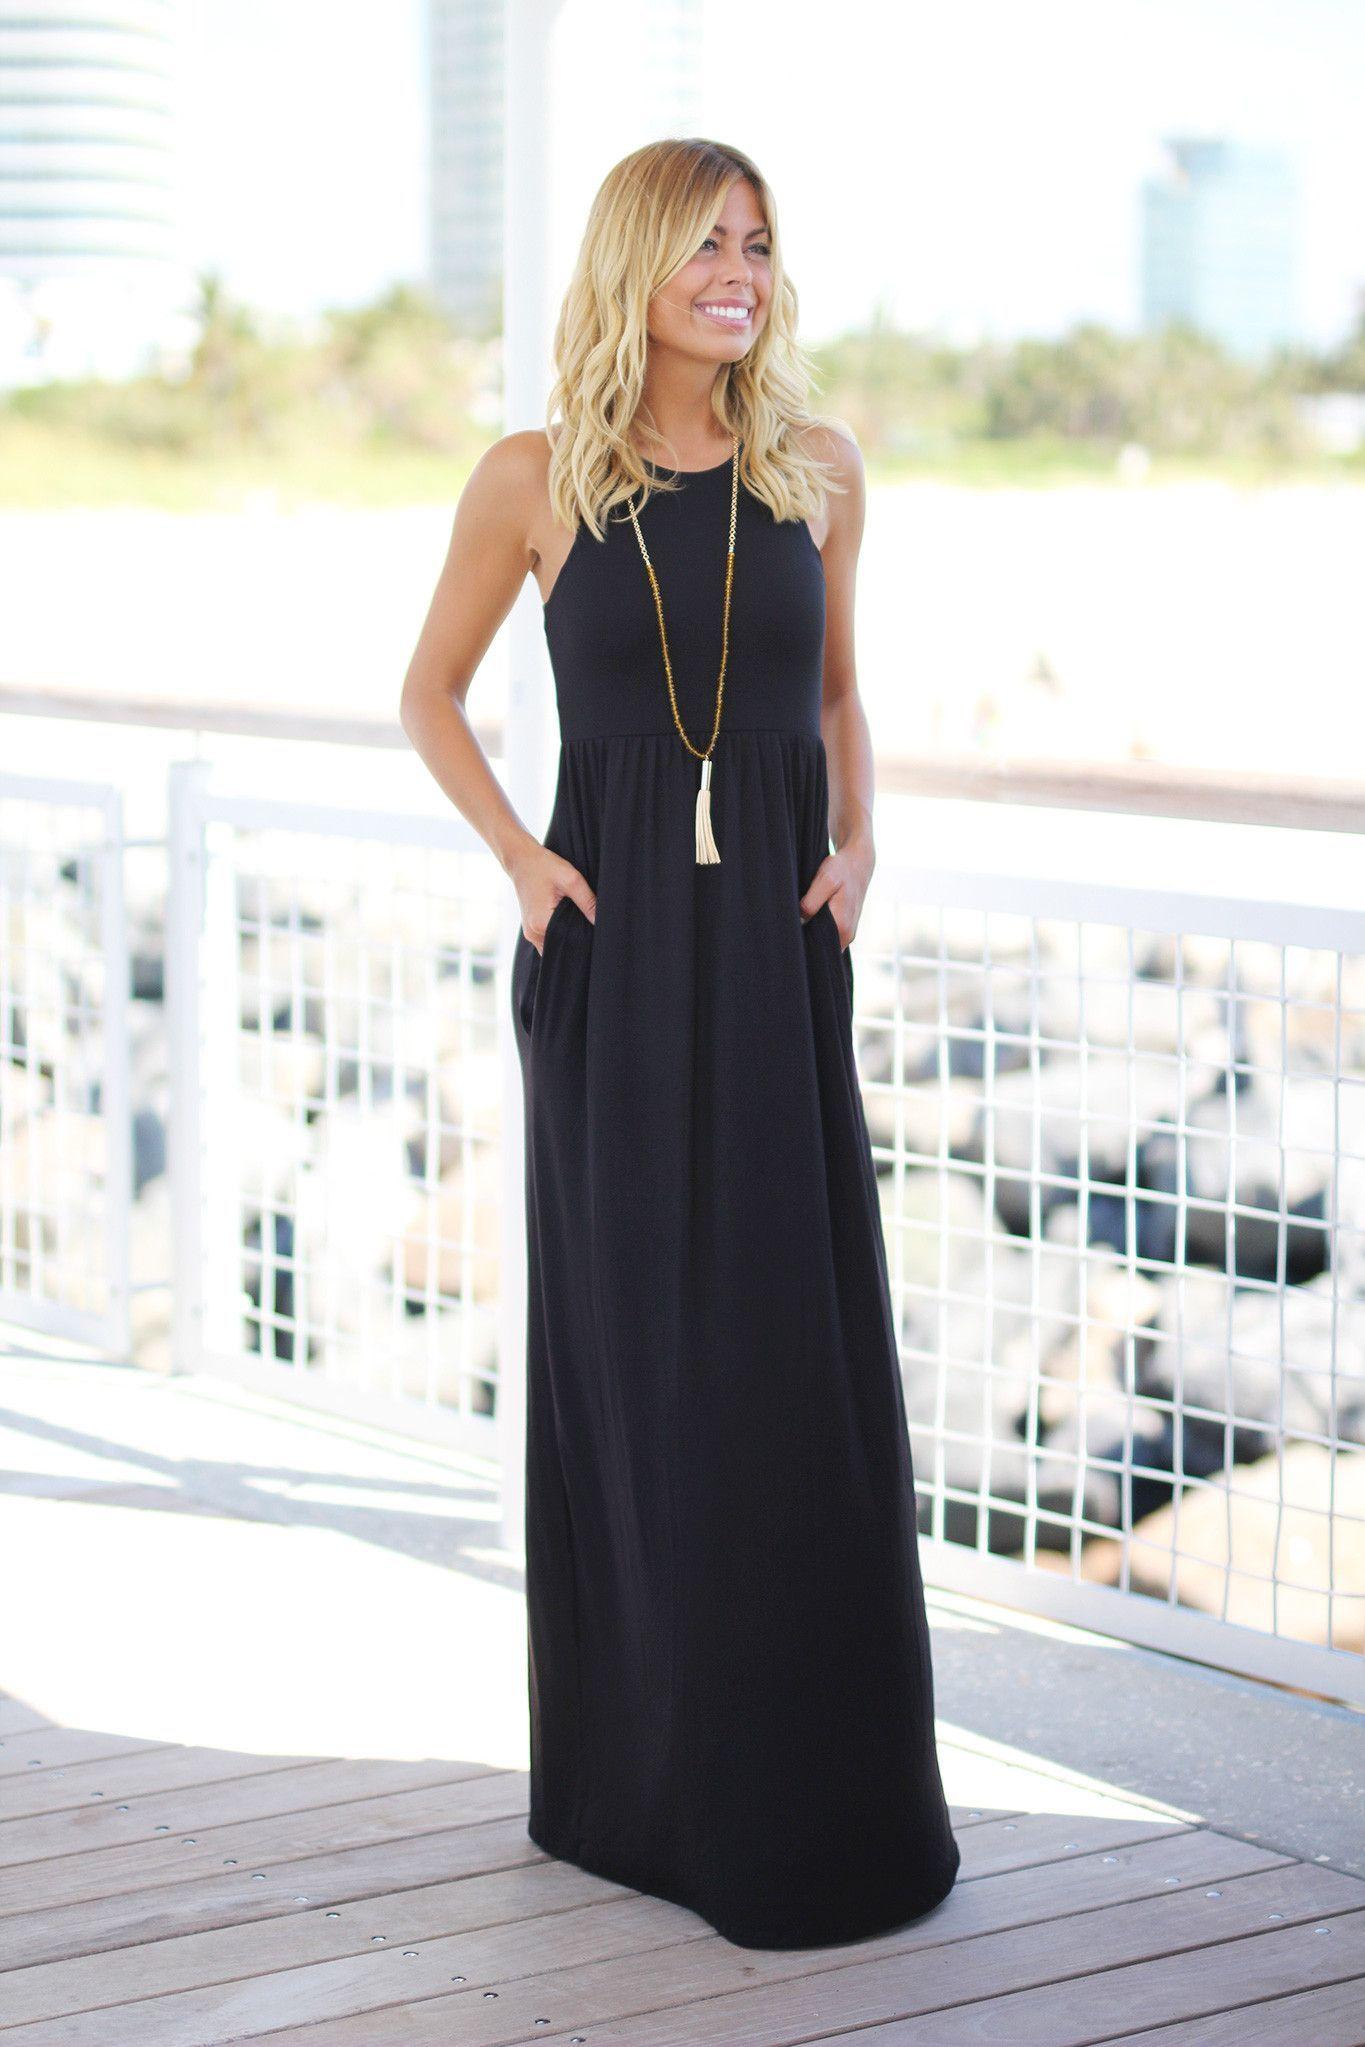 Black Maxi Dress with Pockets | Pinterest